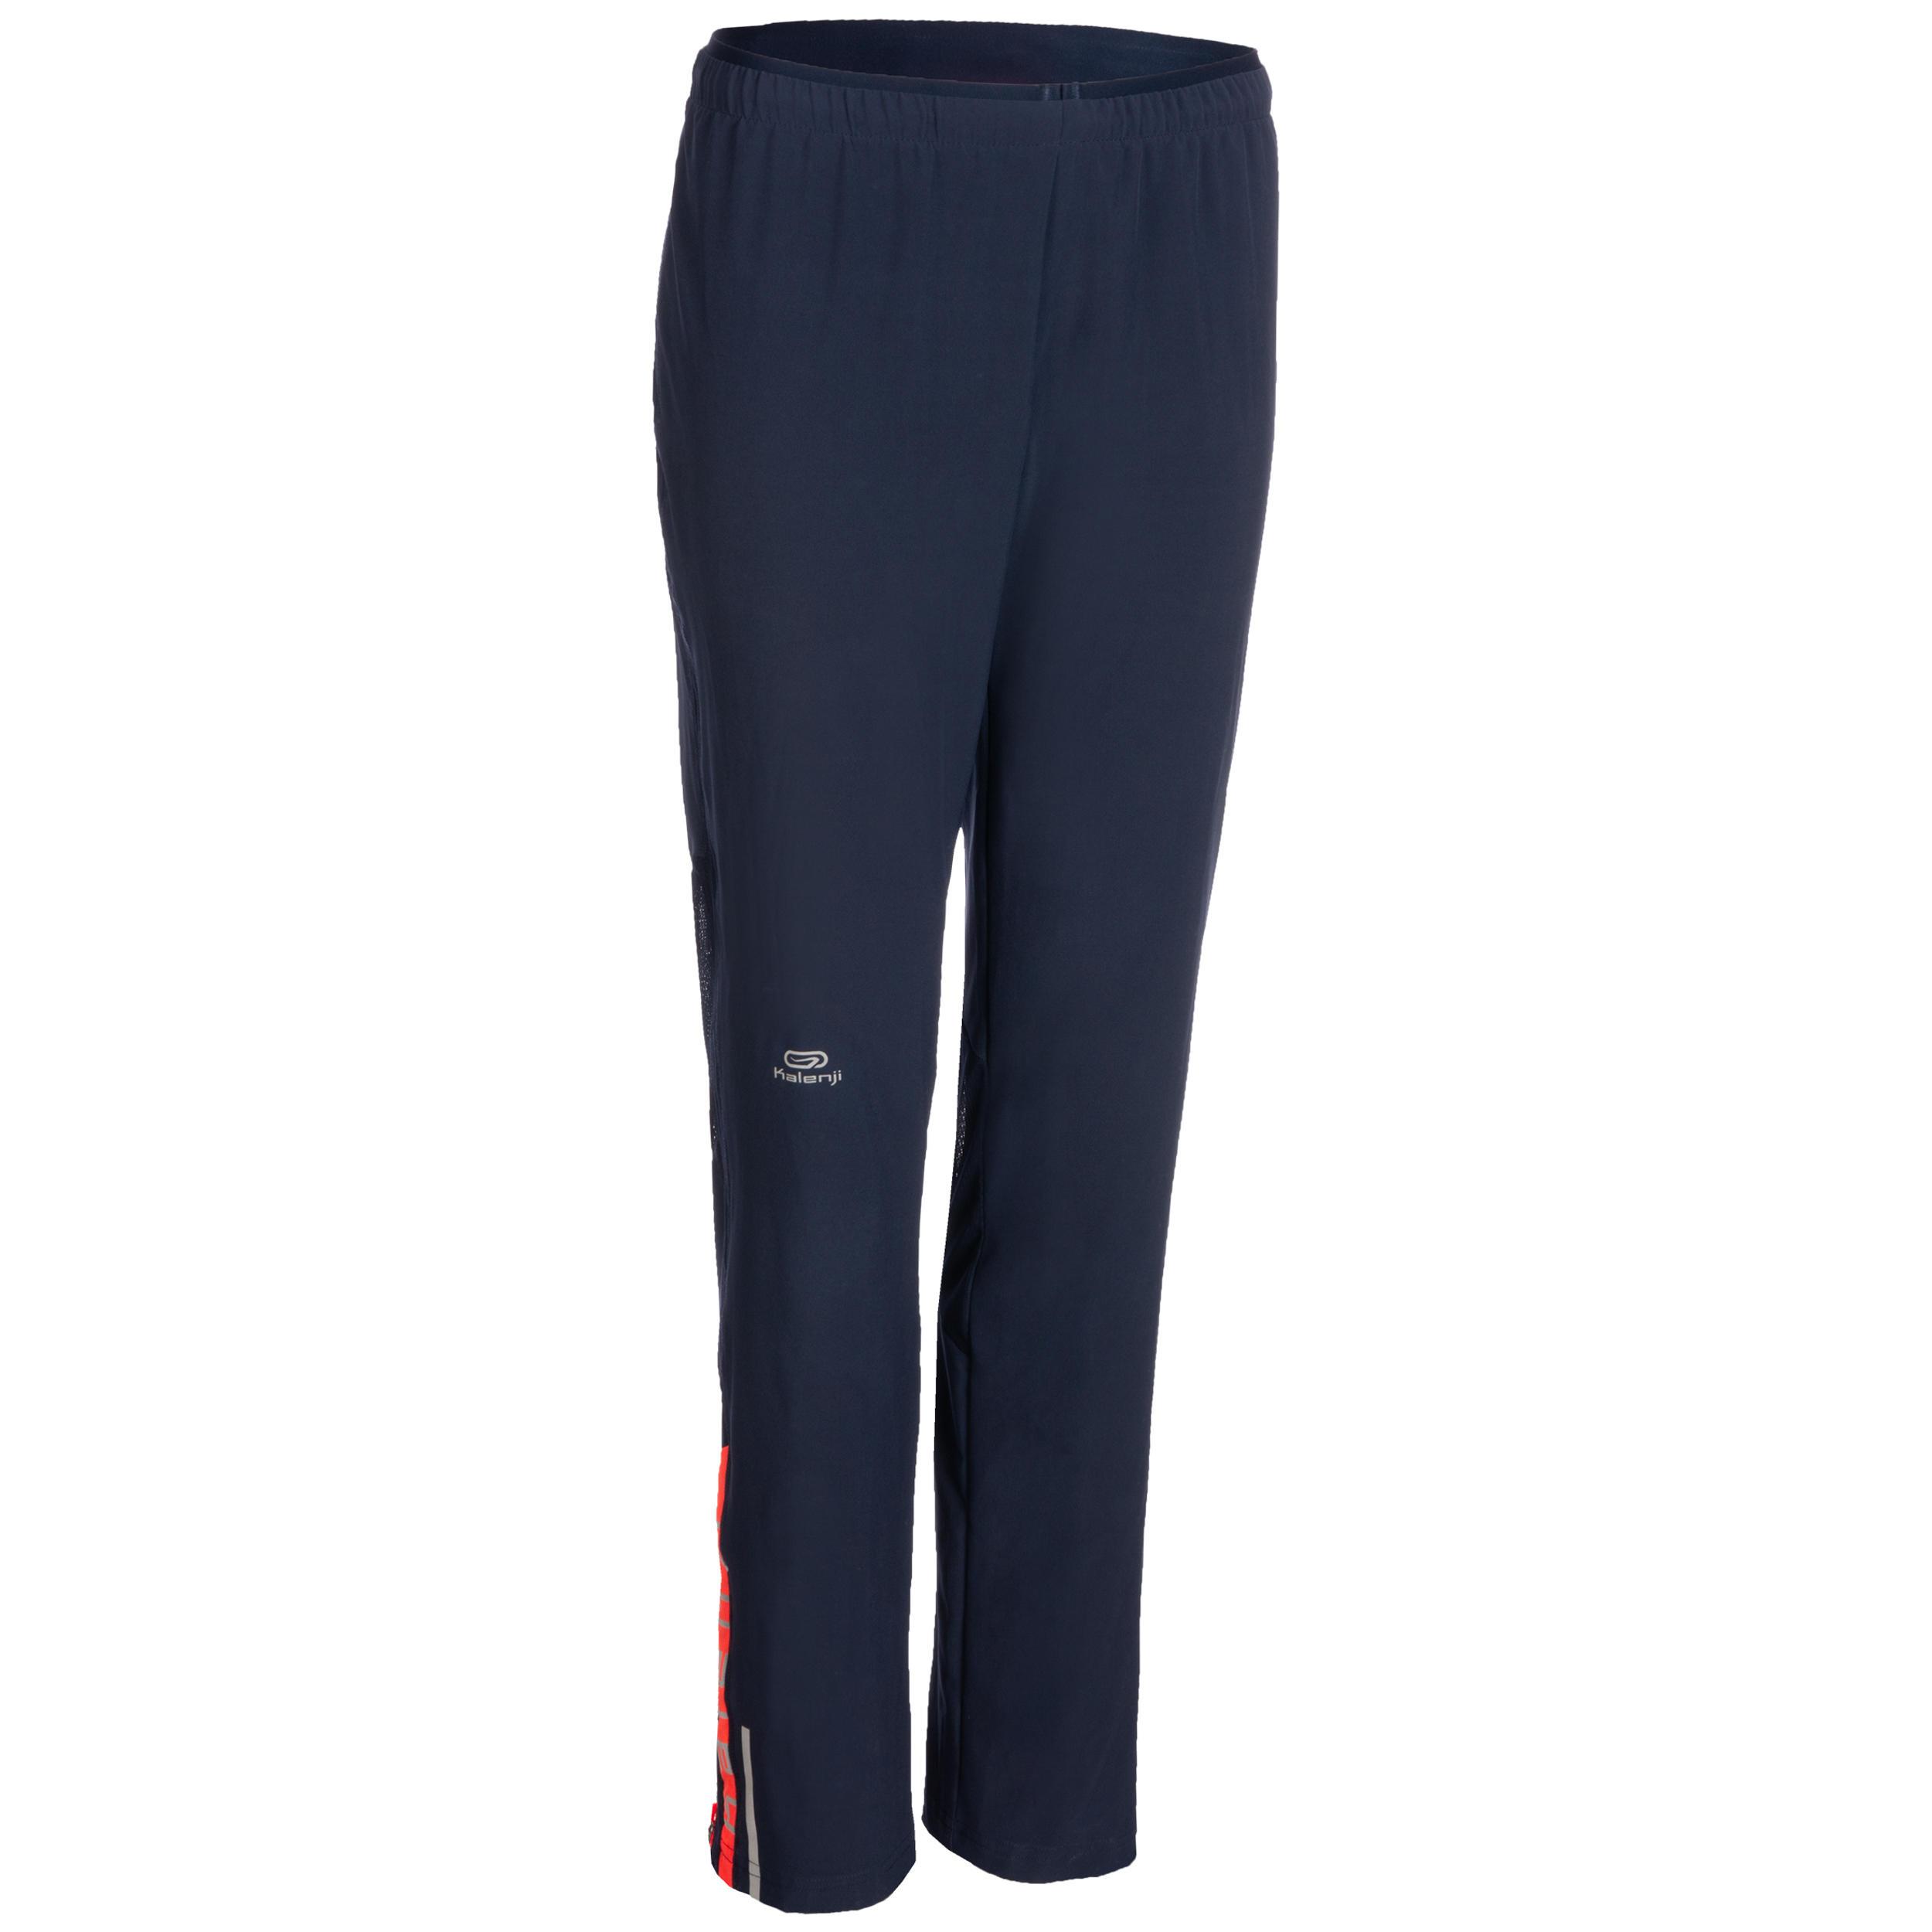 Pantalon Atletism Damă imagine